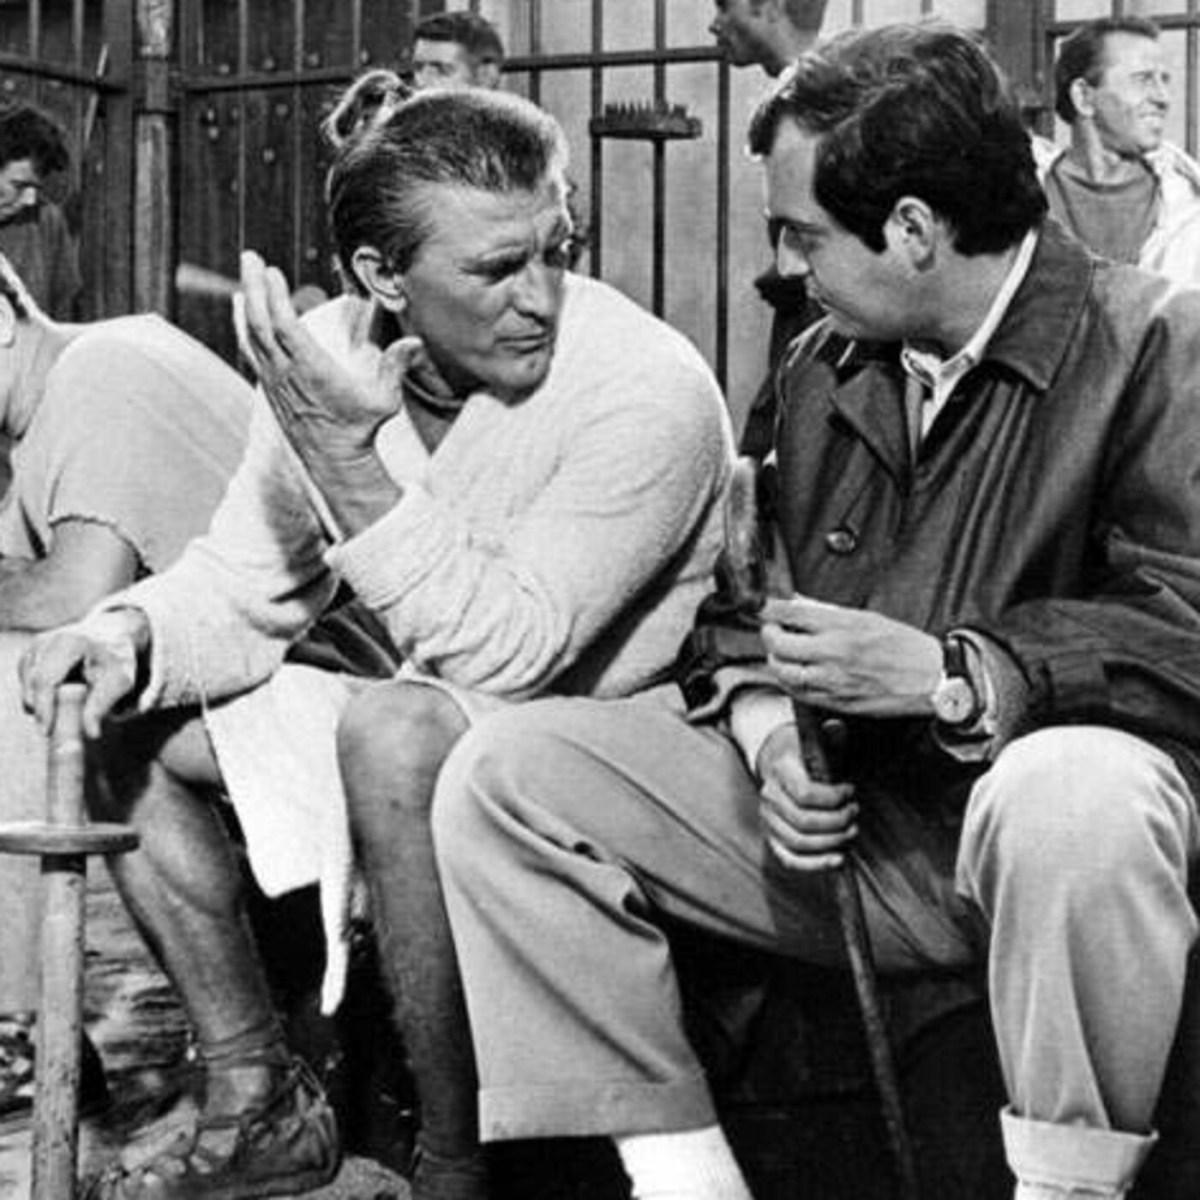 GMV: Las películas que produjo Kirk Douglas (parte 2/2)